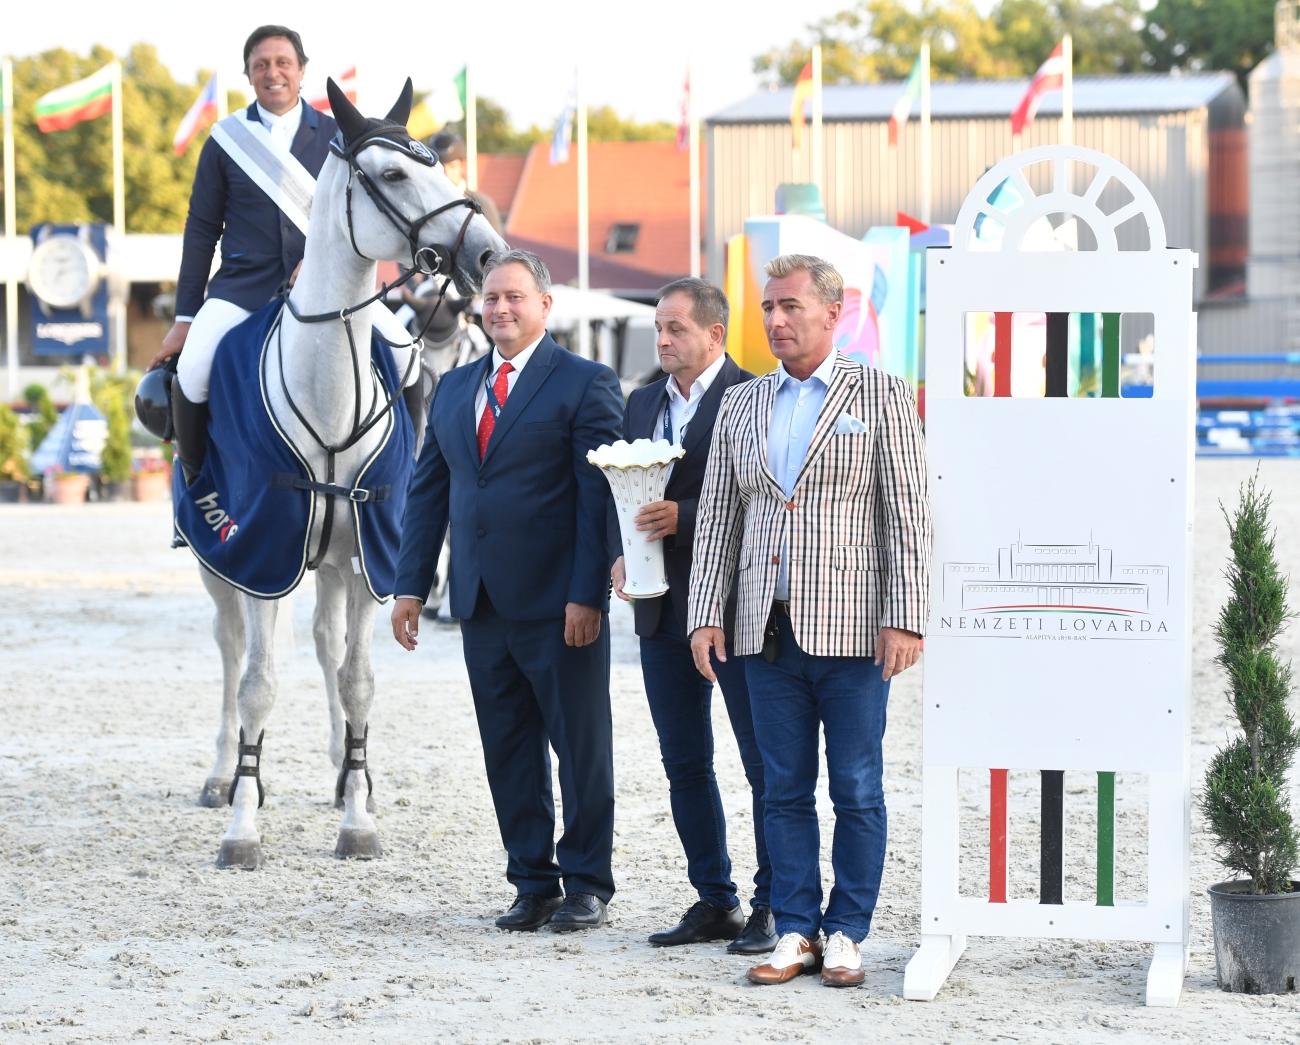 2018.08.12.99.99 CSIO Budapest 5 Exim Cel Luis S. Gonçalves & Dominka vd Lucashoeve Hadju Krisztina